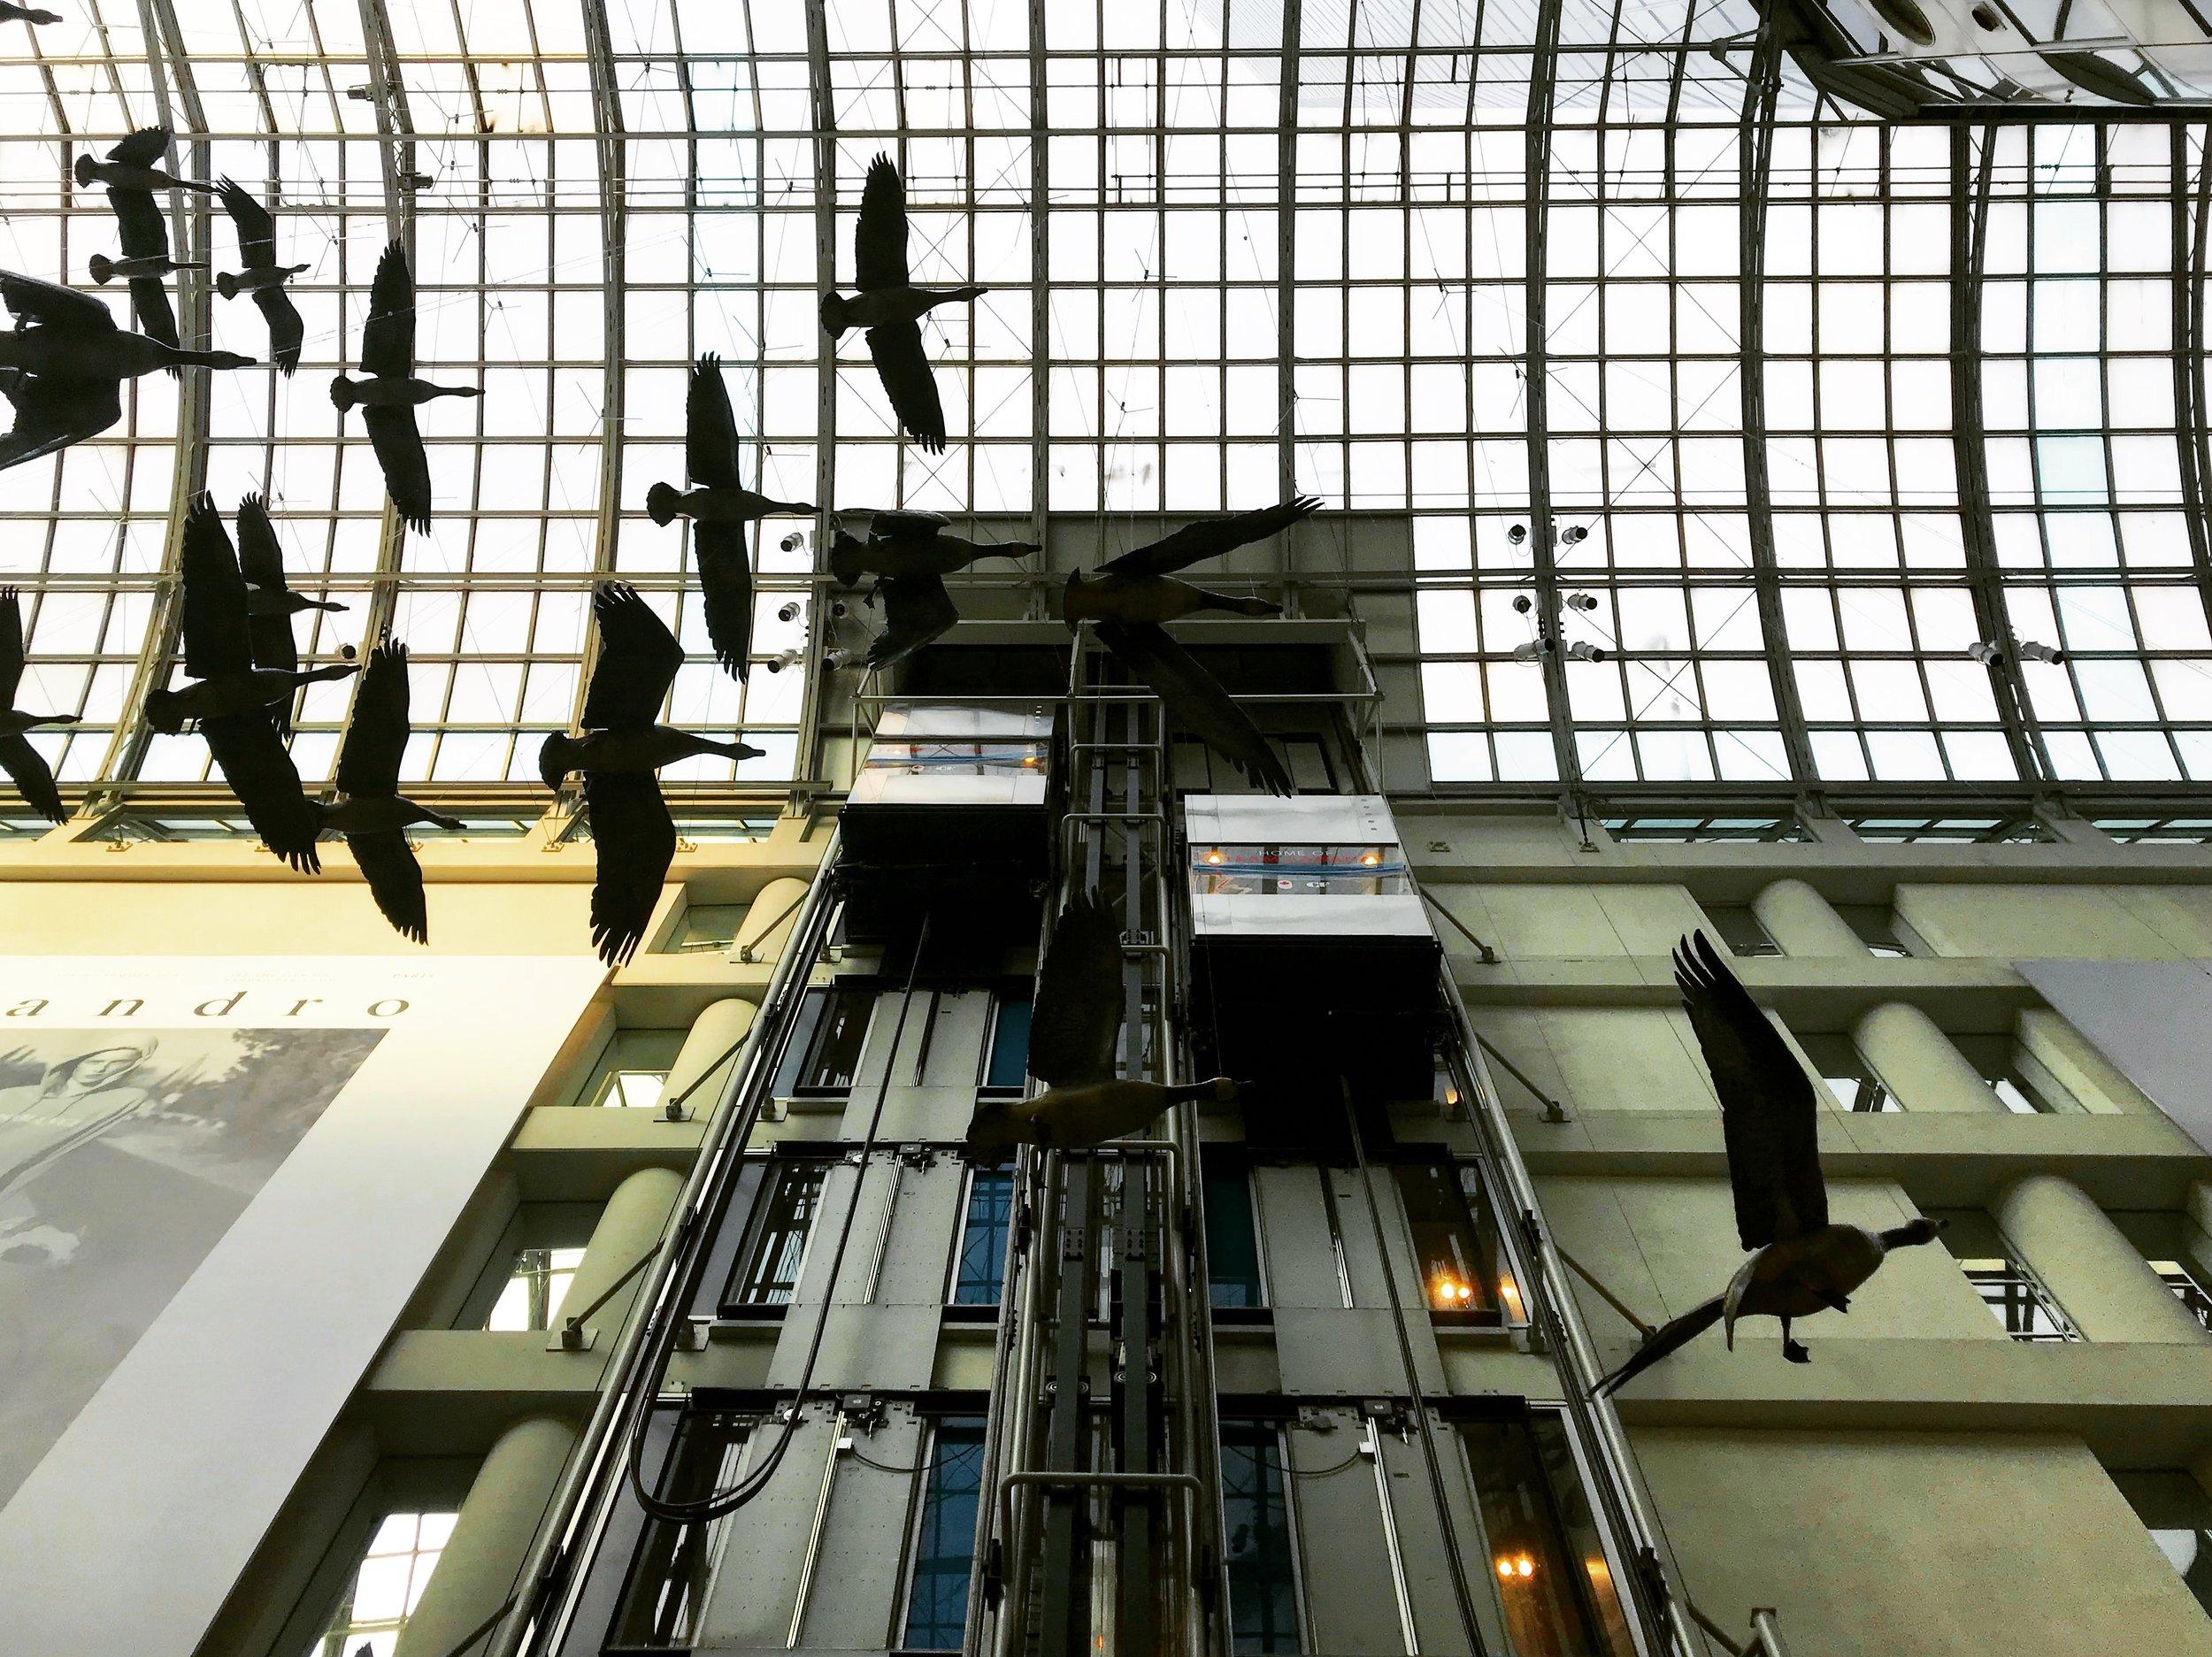 Toronto Eatons Centre Traction Elevators